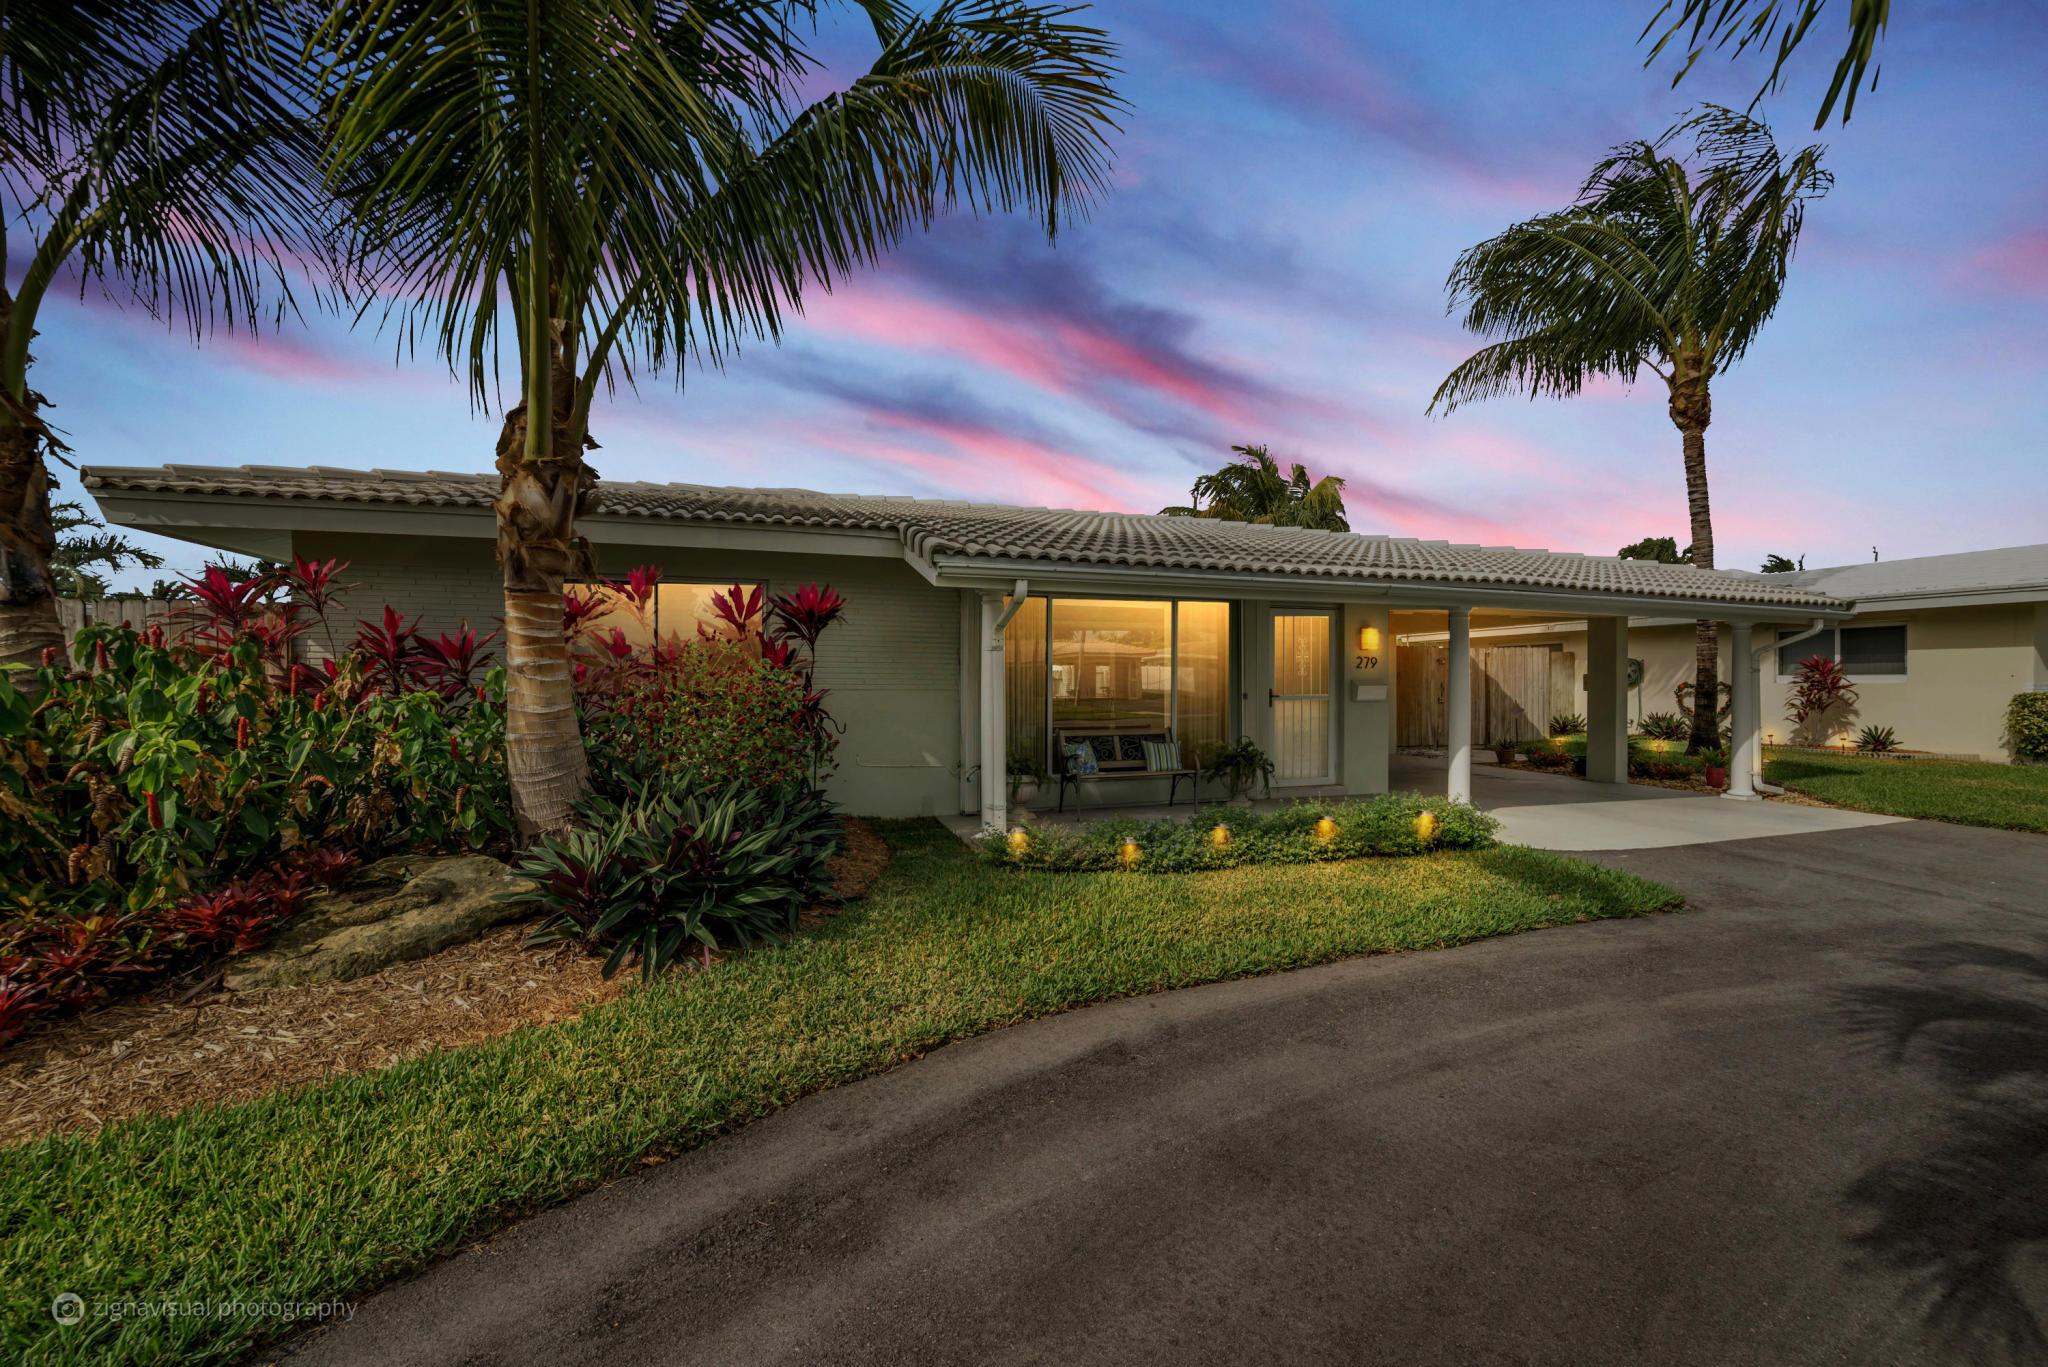 279 SE 2nd Ave, Pompano Beach, FL 33060 - Estimate and Home Details ...